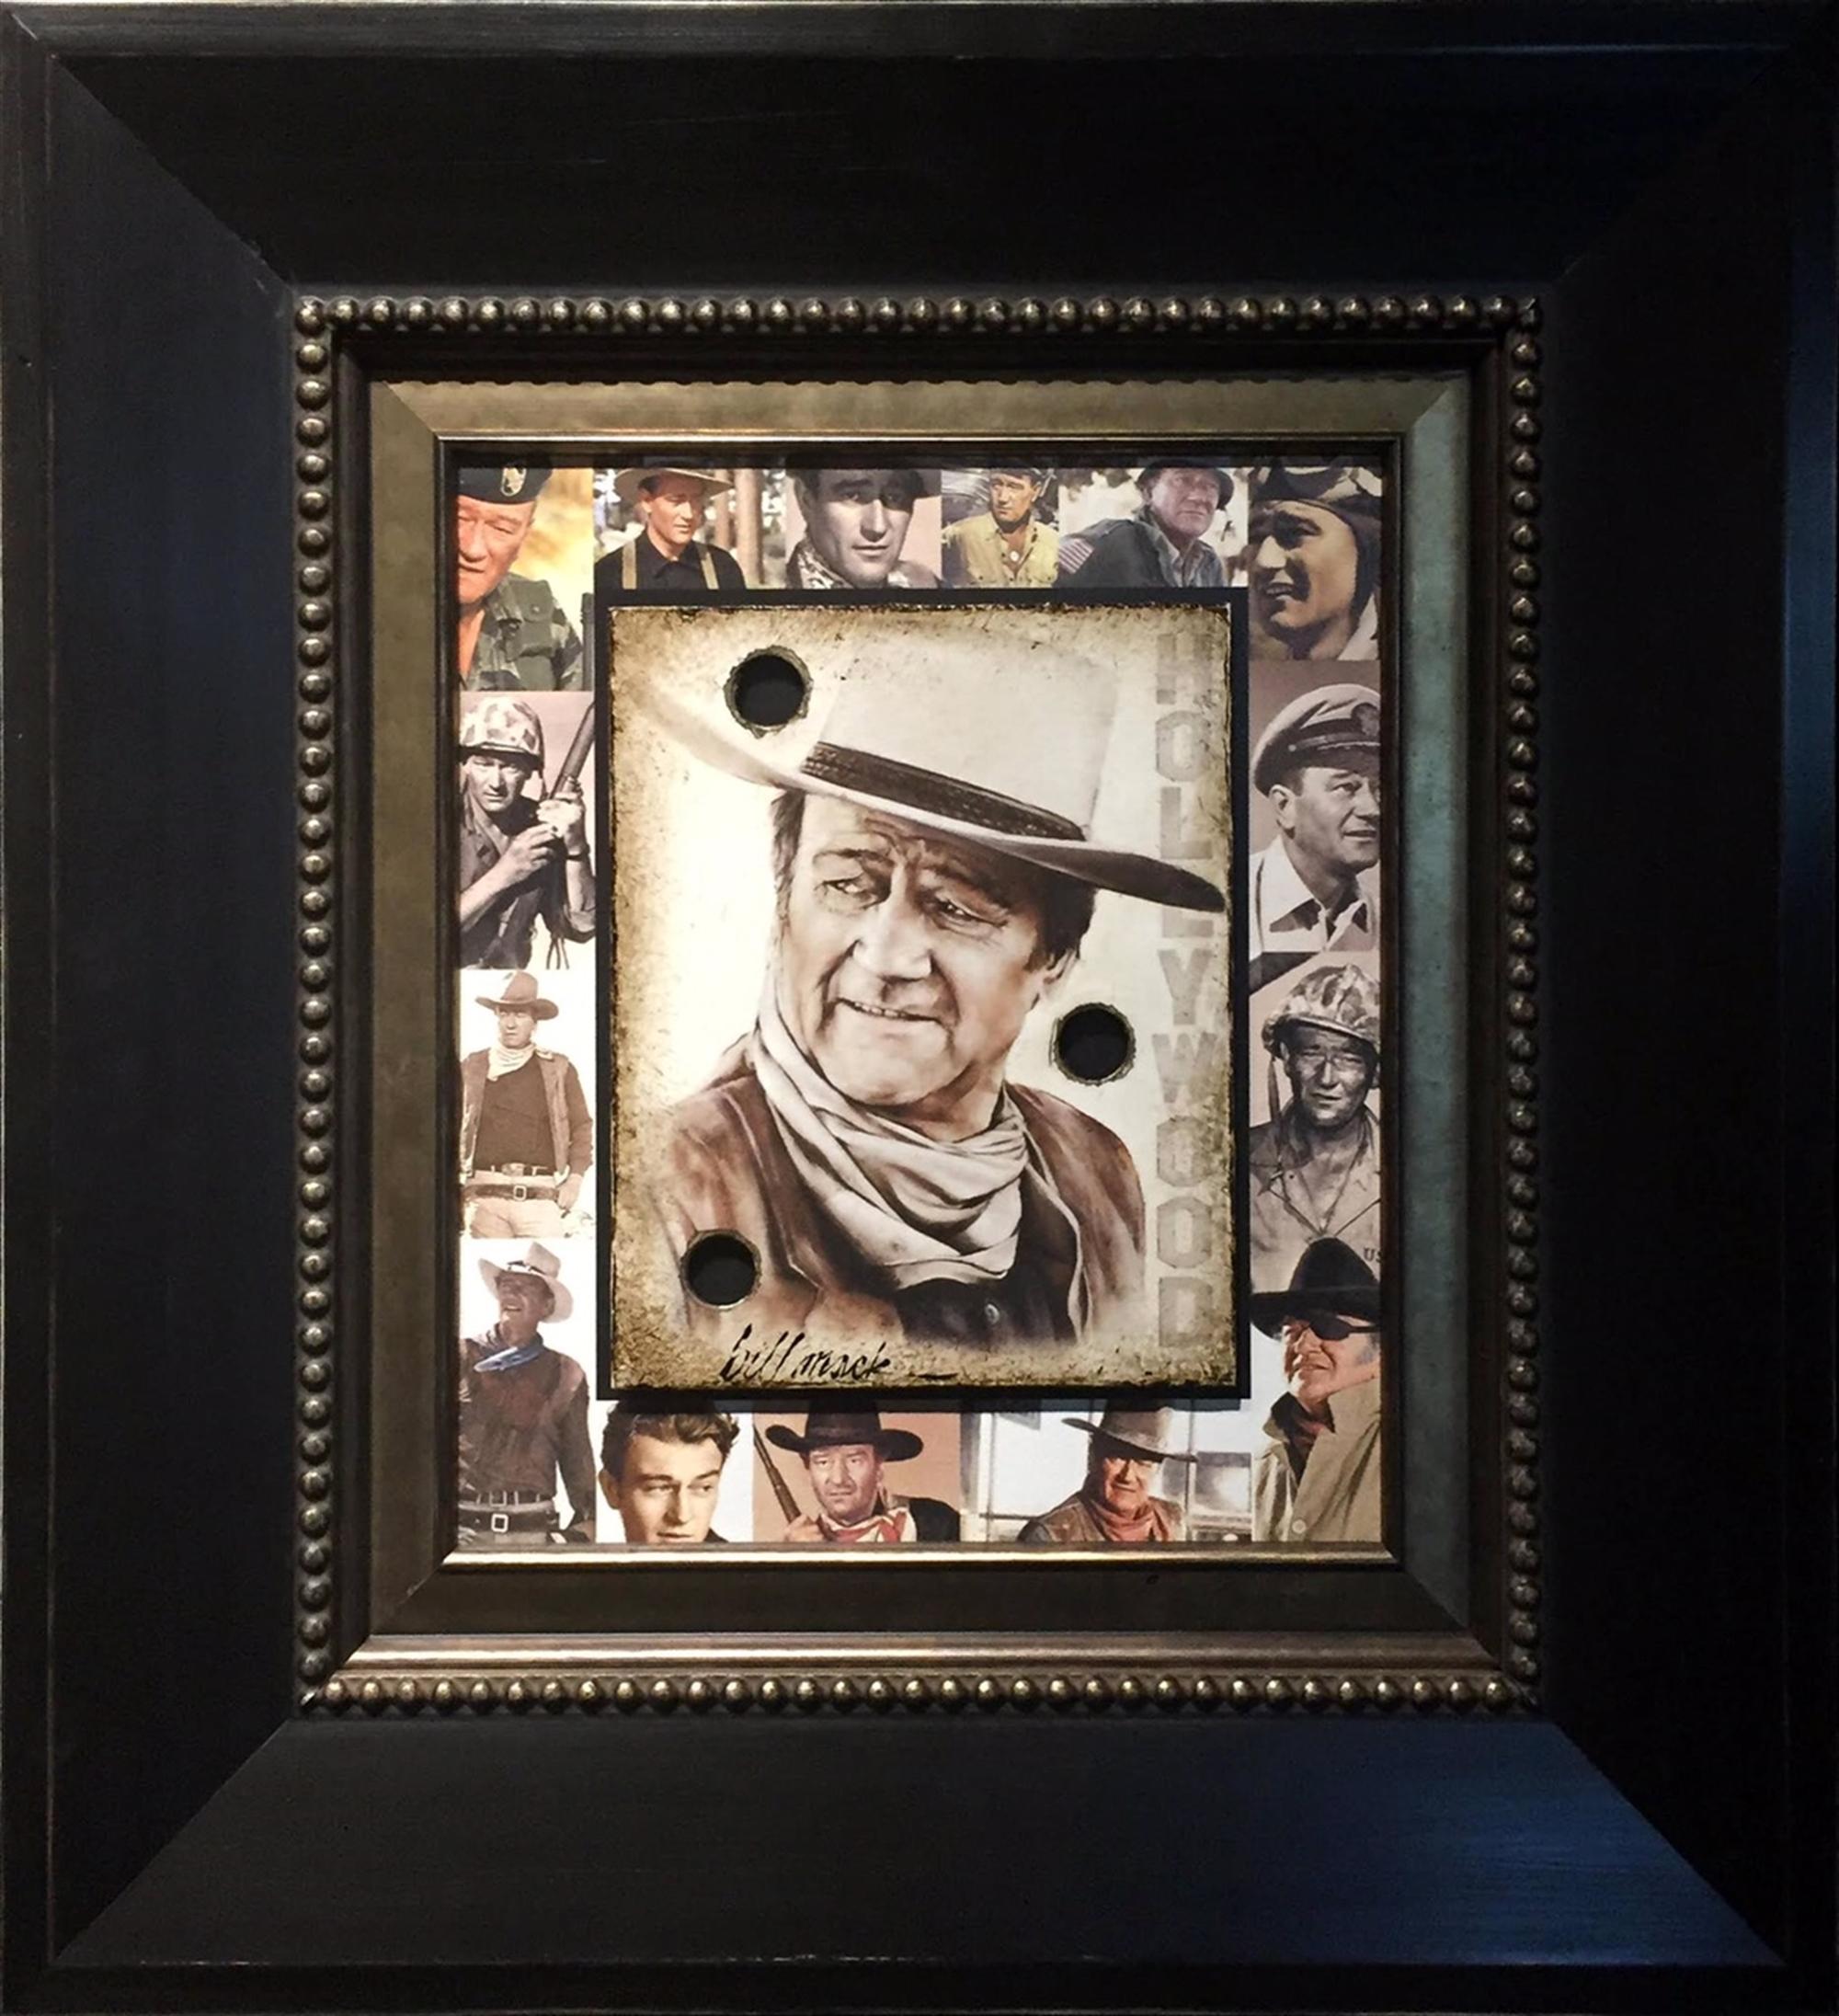 John Wayne New Variant by Bill Mack Hollywood Sign